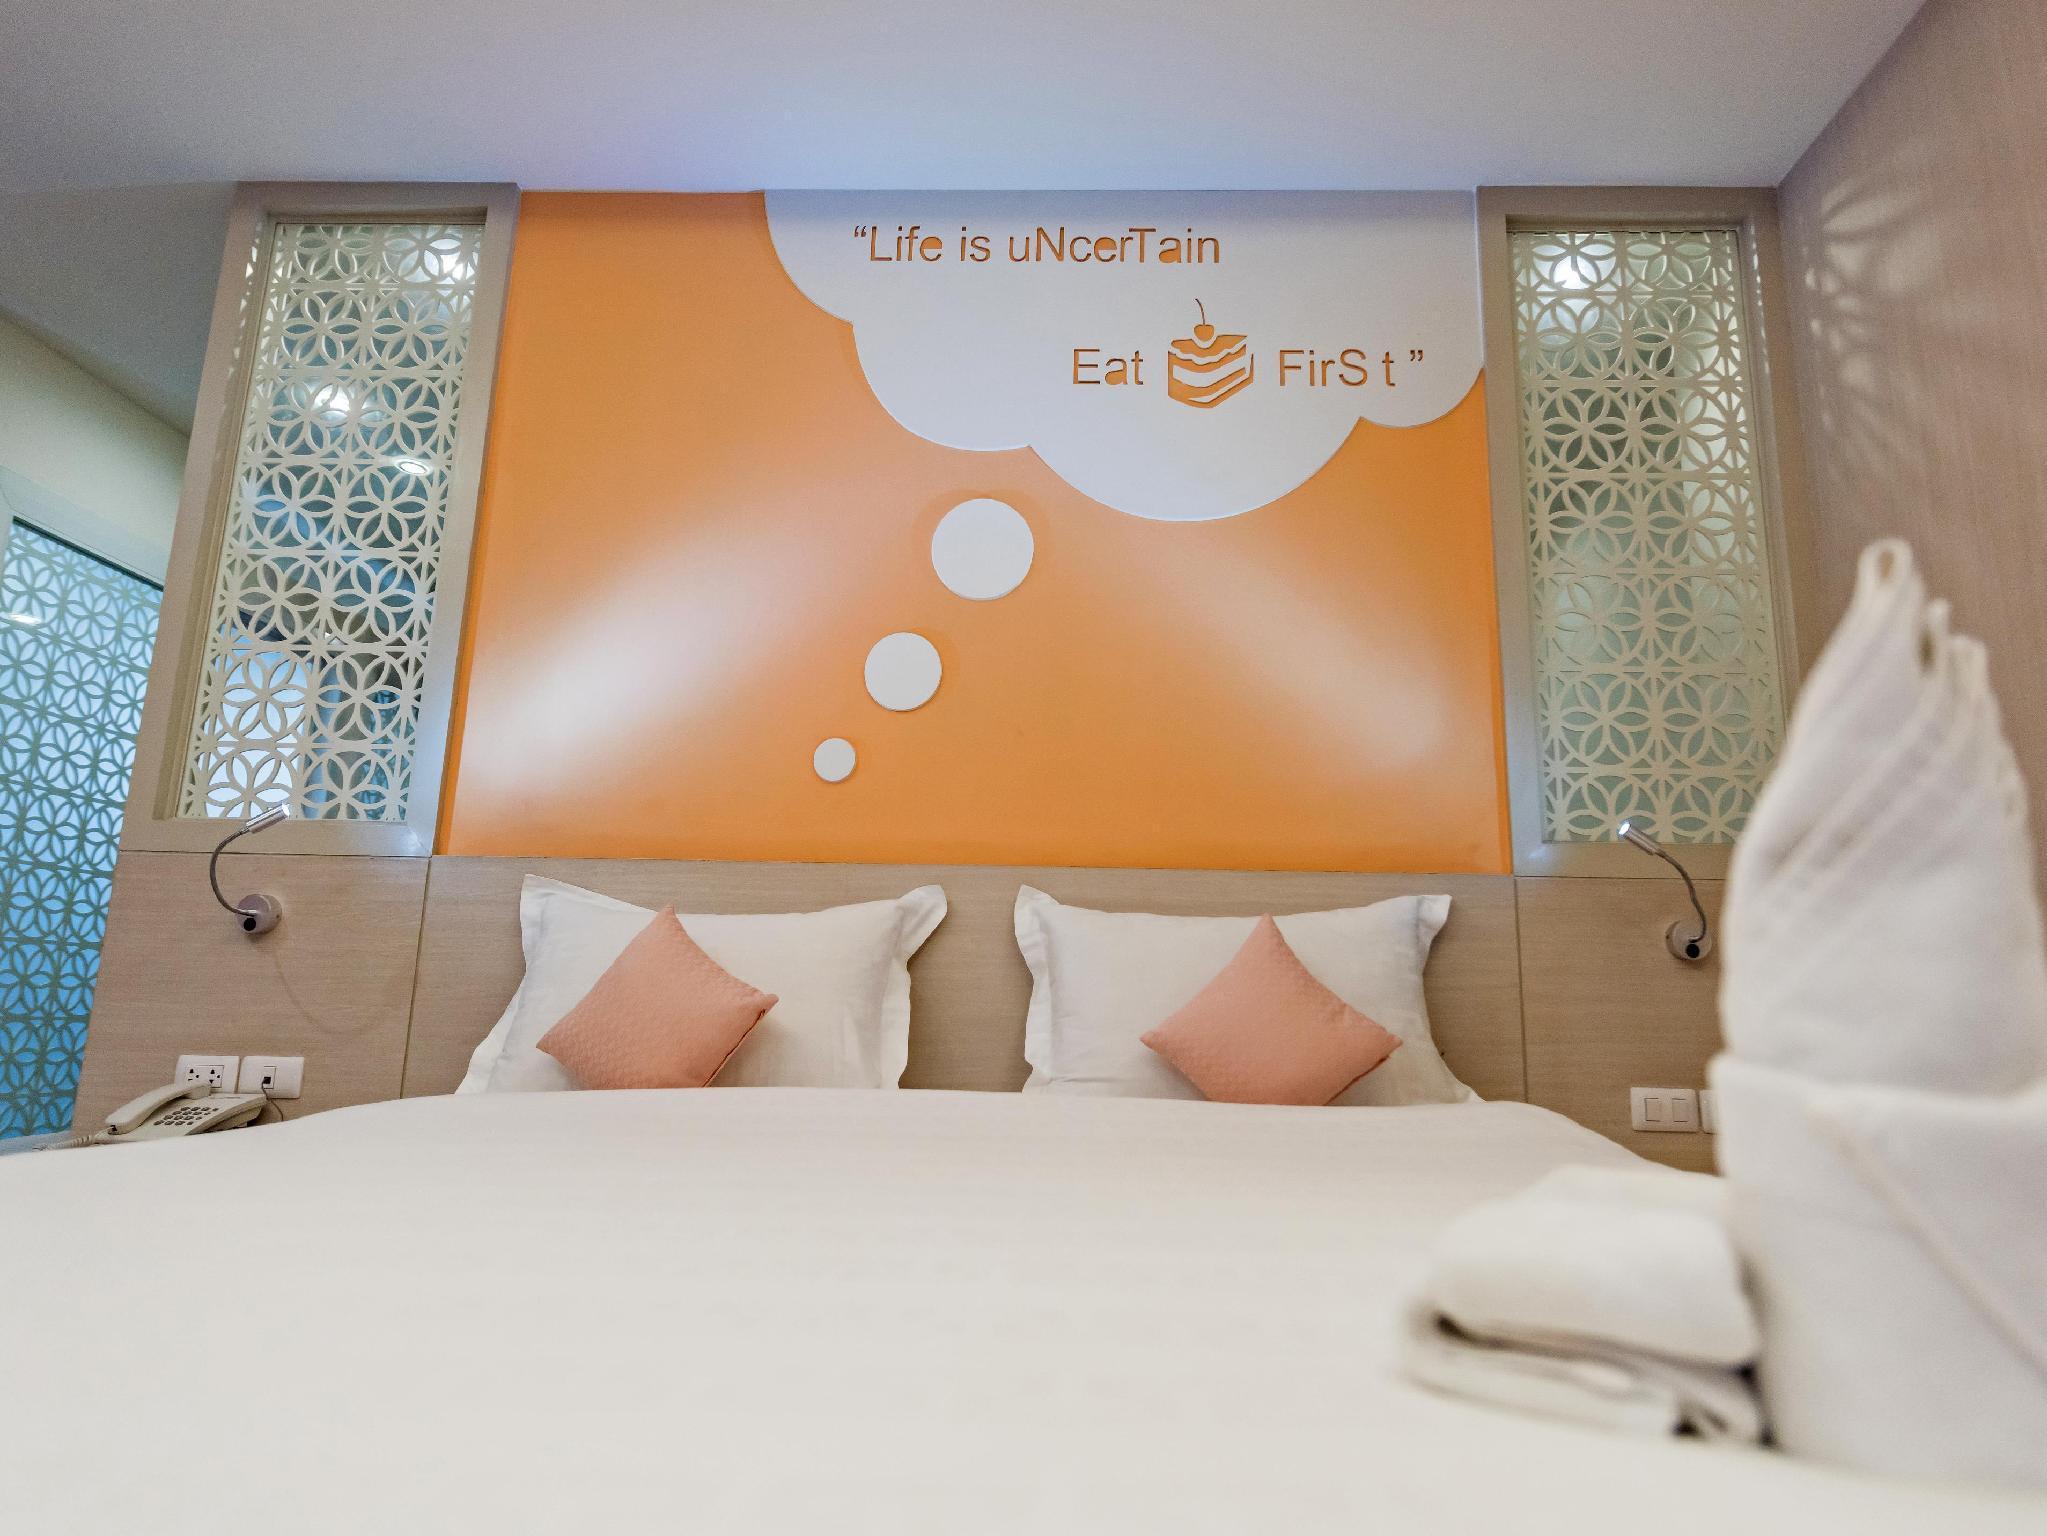 The Tint at Phuket Town Hotel โรงแรมเดอะ ทินท์ แอท ภูเก็ต ทาวน์